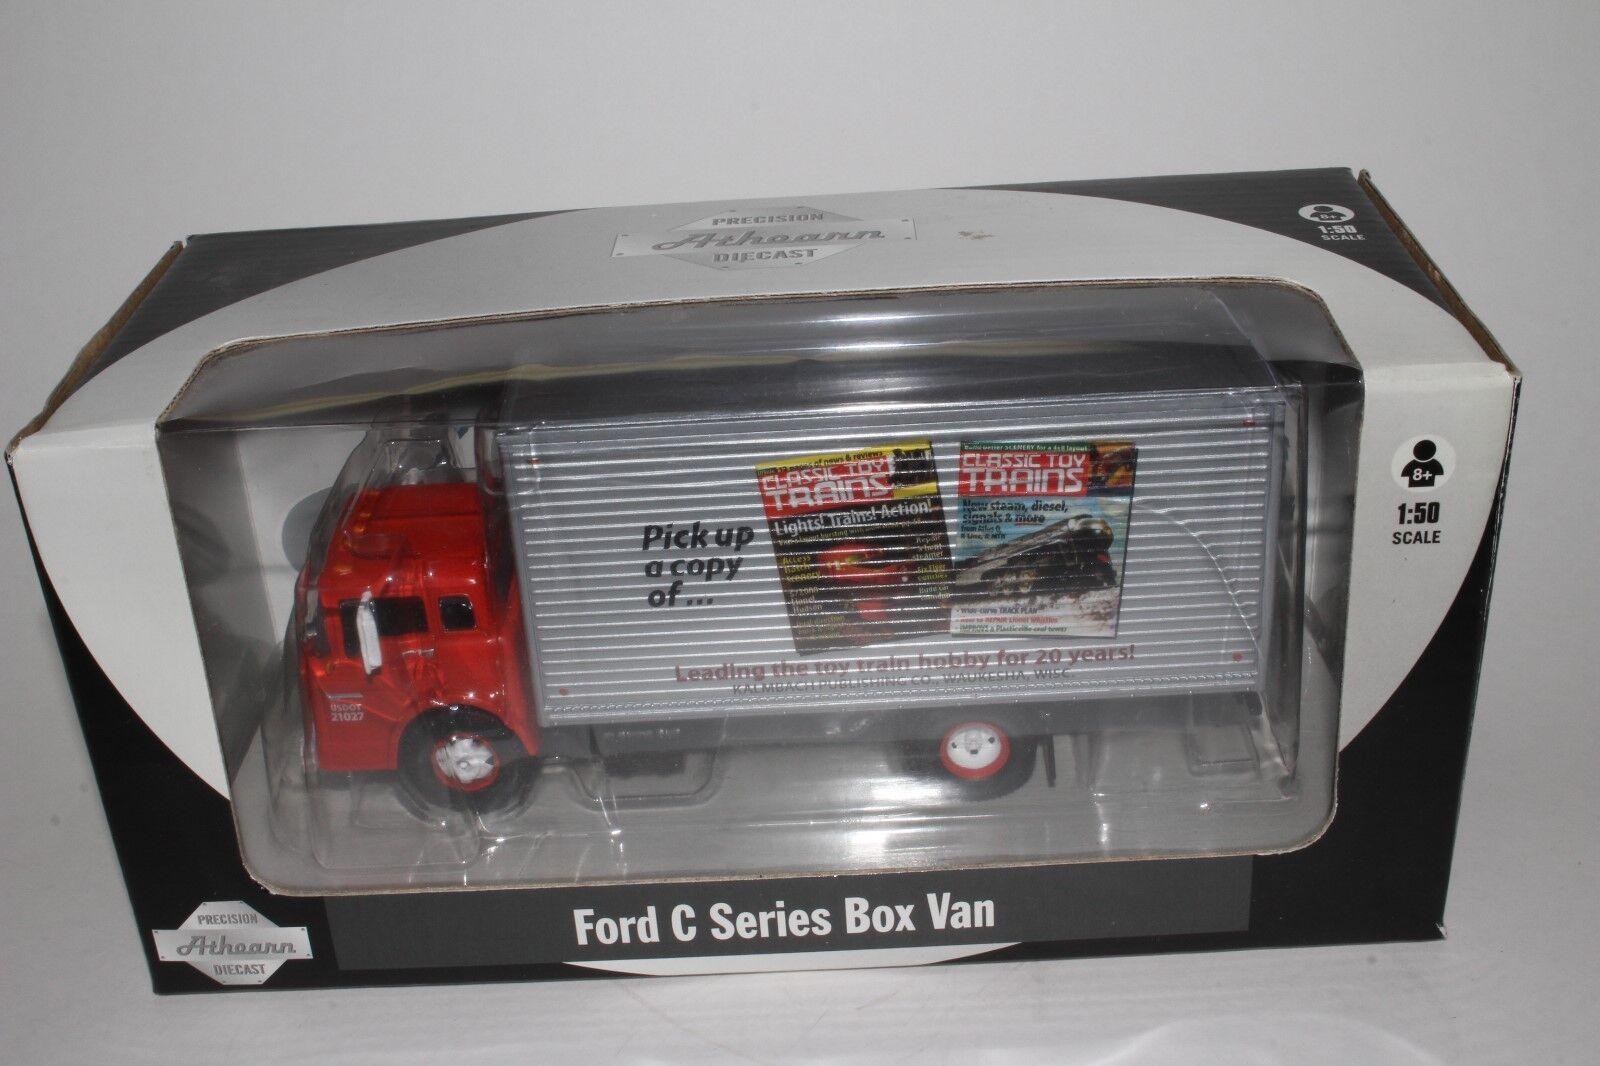 Athearn Ford C Series Box Lkw, Klassisch Spielzeug Trains, O Maßstab   1 50,